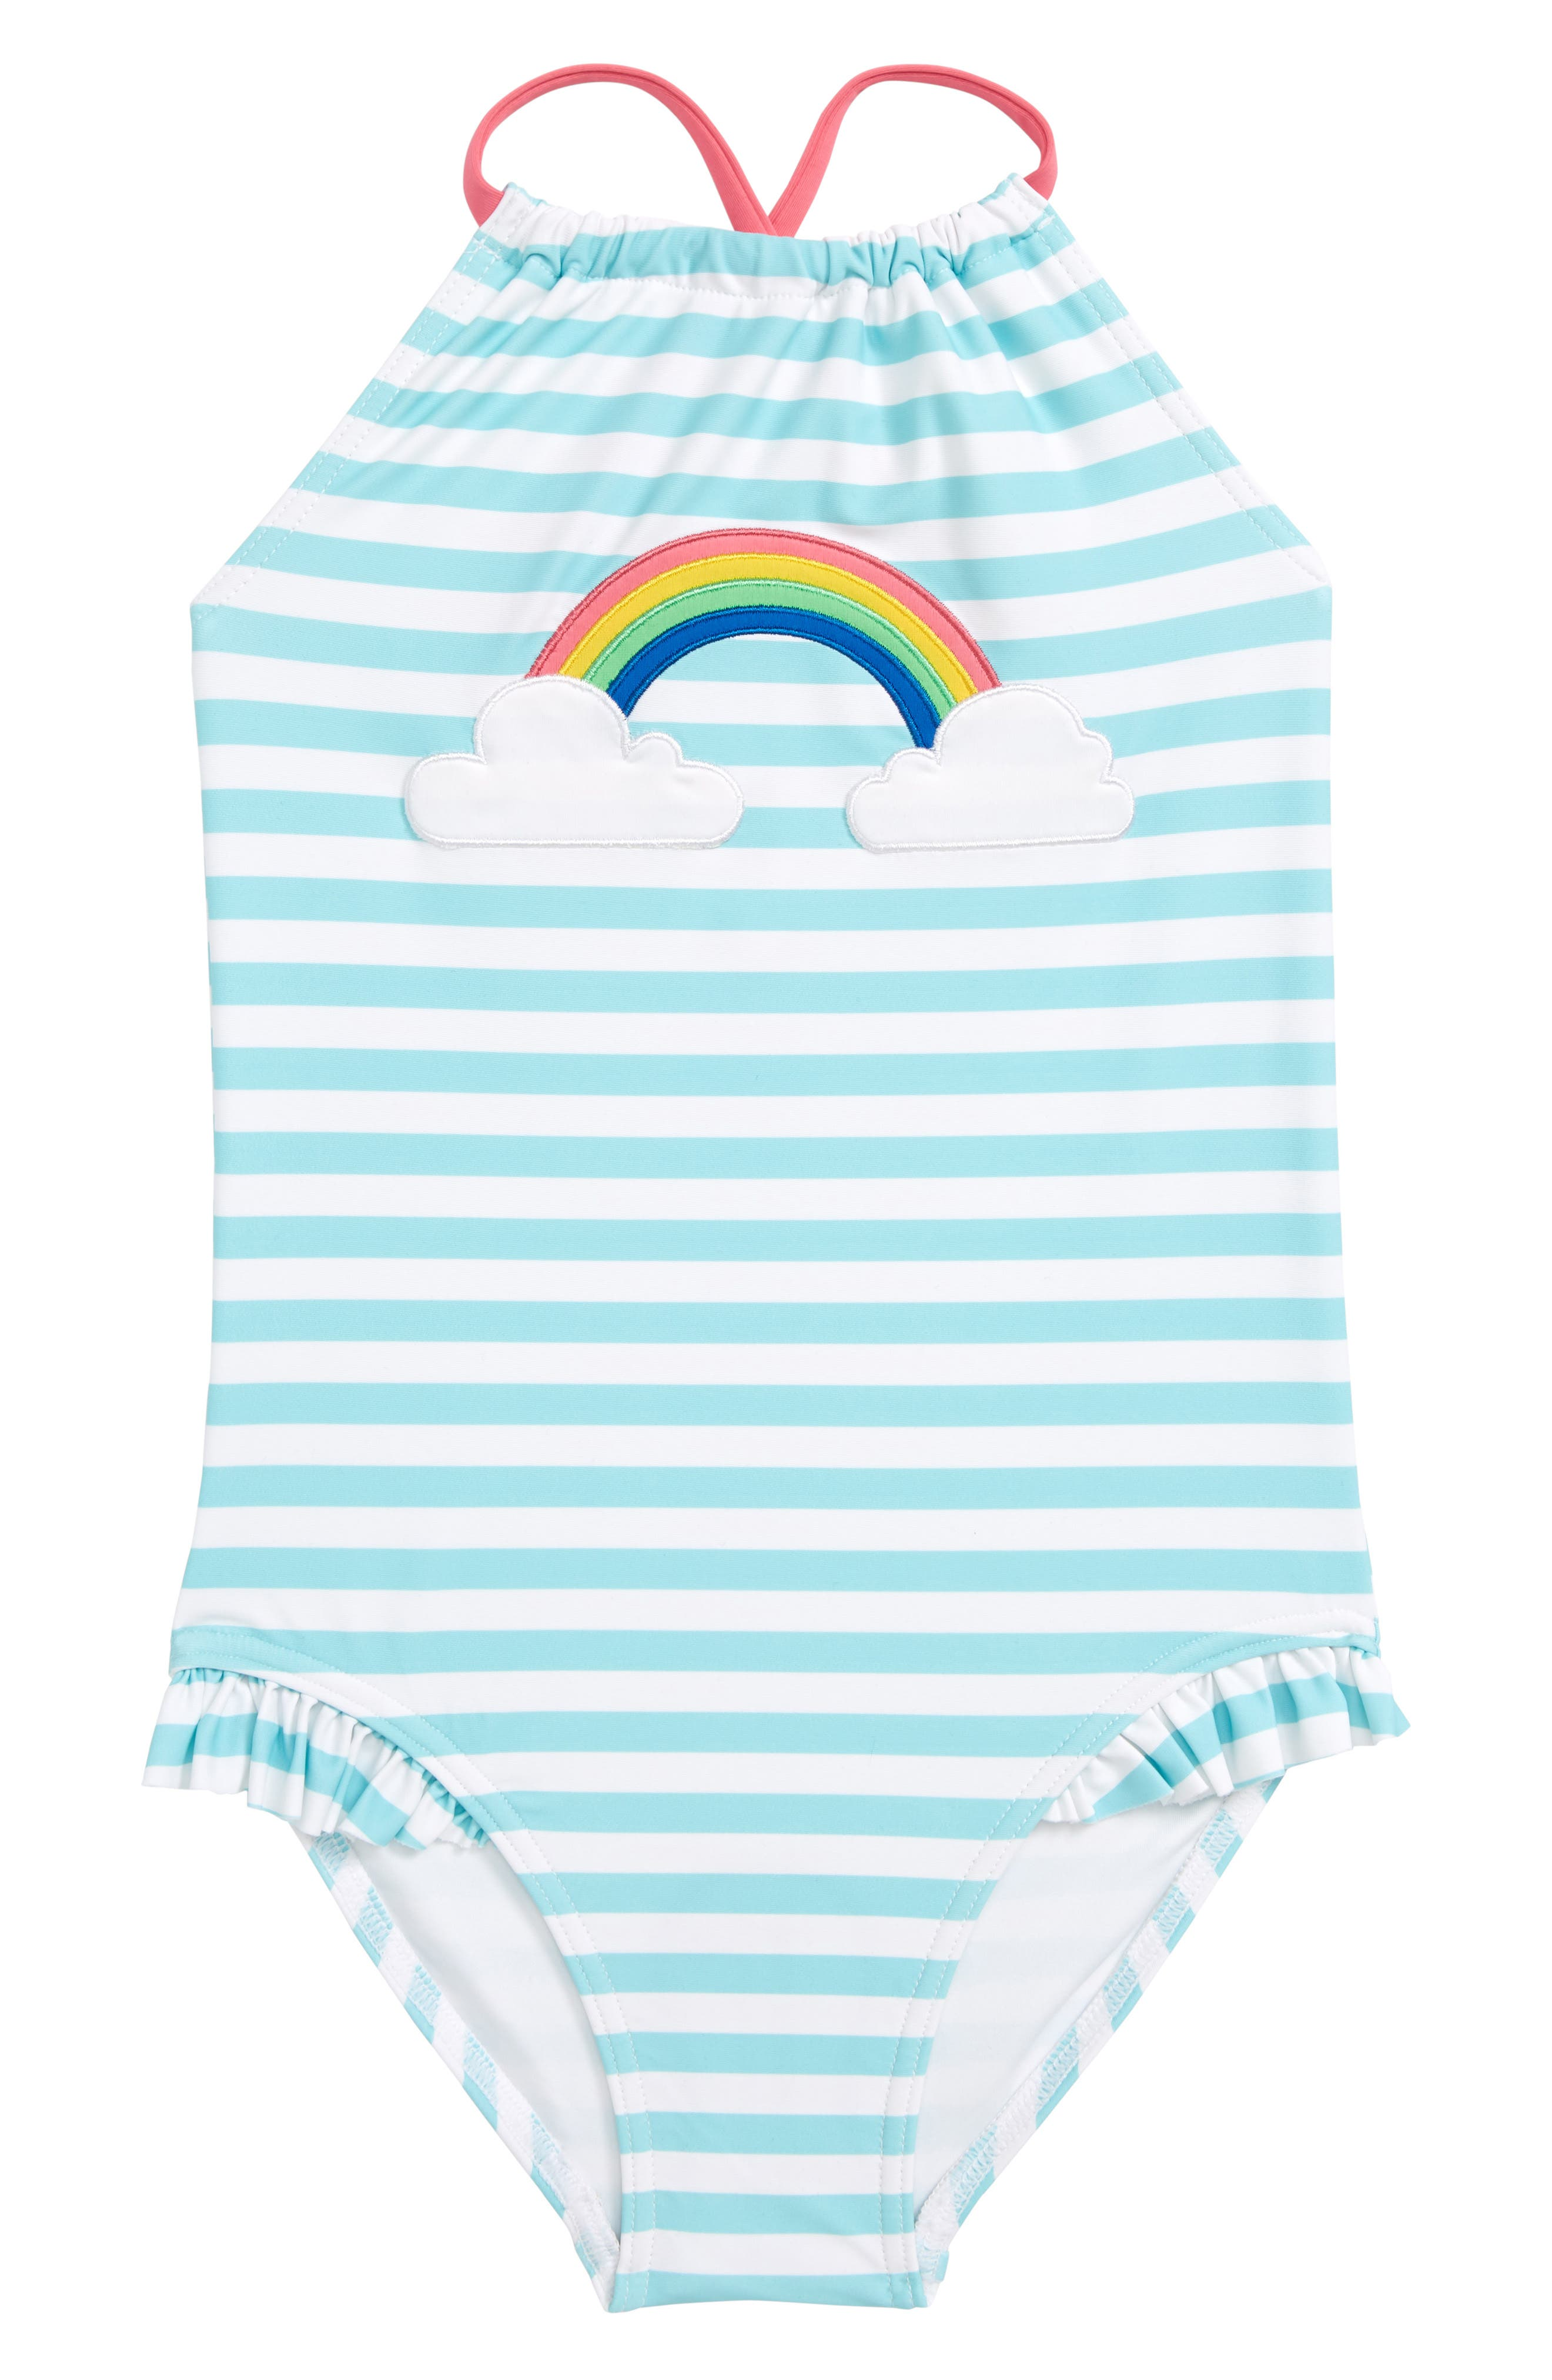 Toddler Girls Tucker  Tate Applique OnePiece Swimsuit Size 2T  Bluegreen